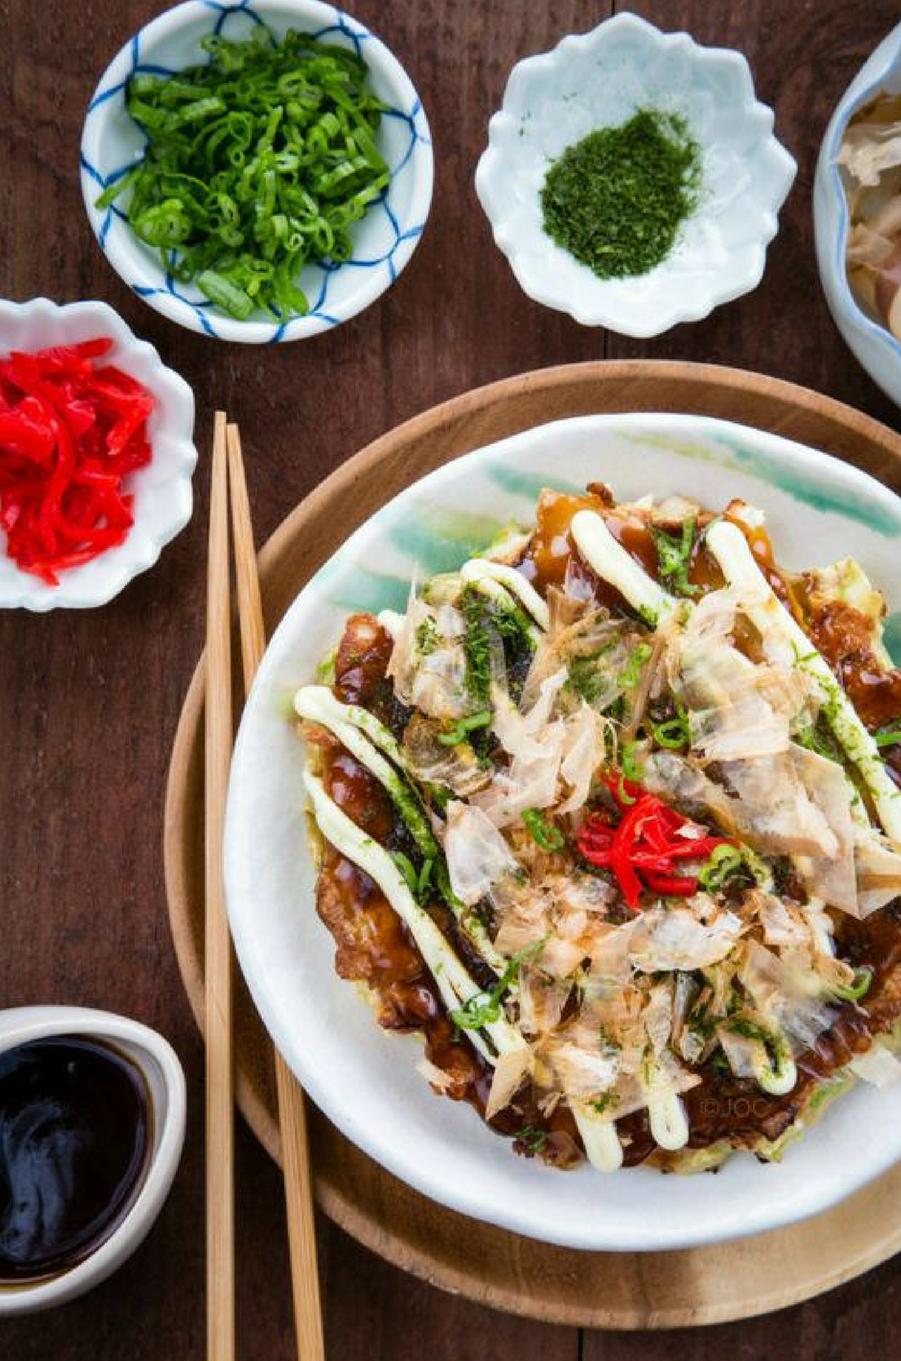 Un plat à base de chou nommé okonomiyakihttps://www.pinterest.fr/pin/140948663312969978/